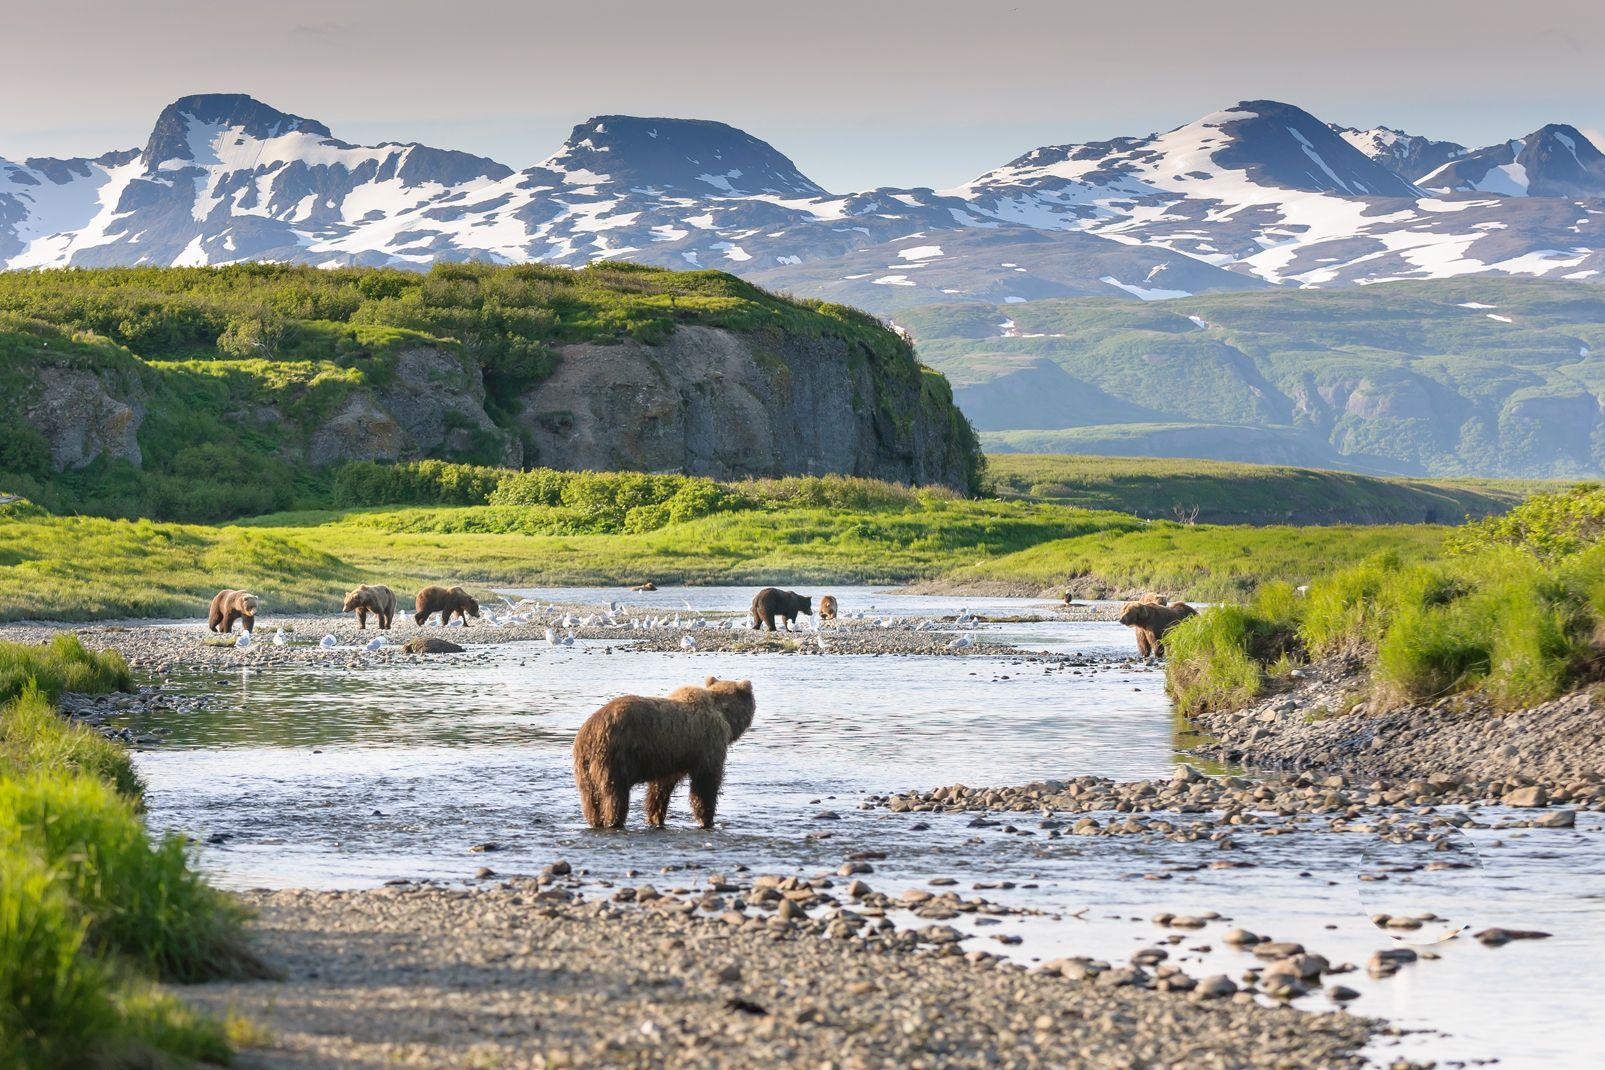 Alaska, United States of America